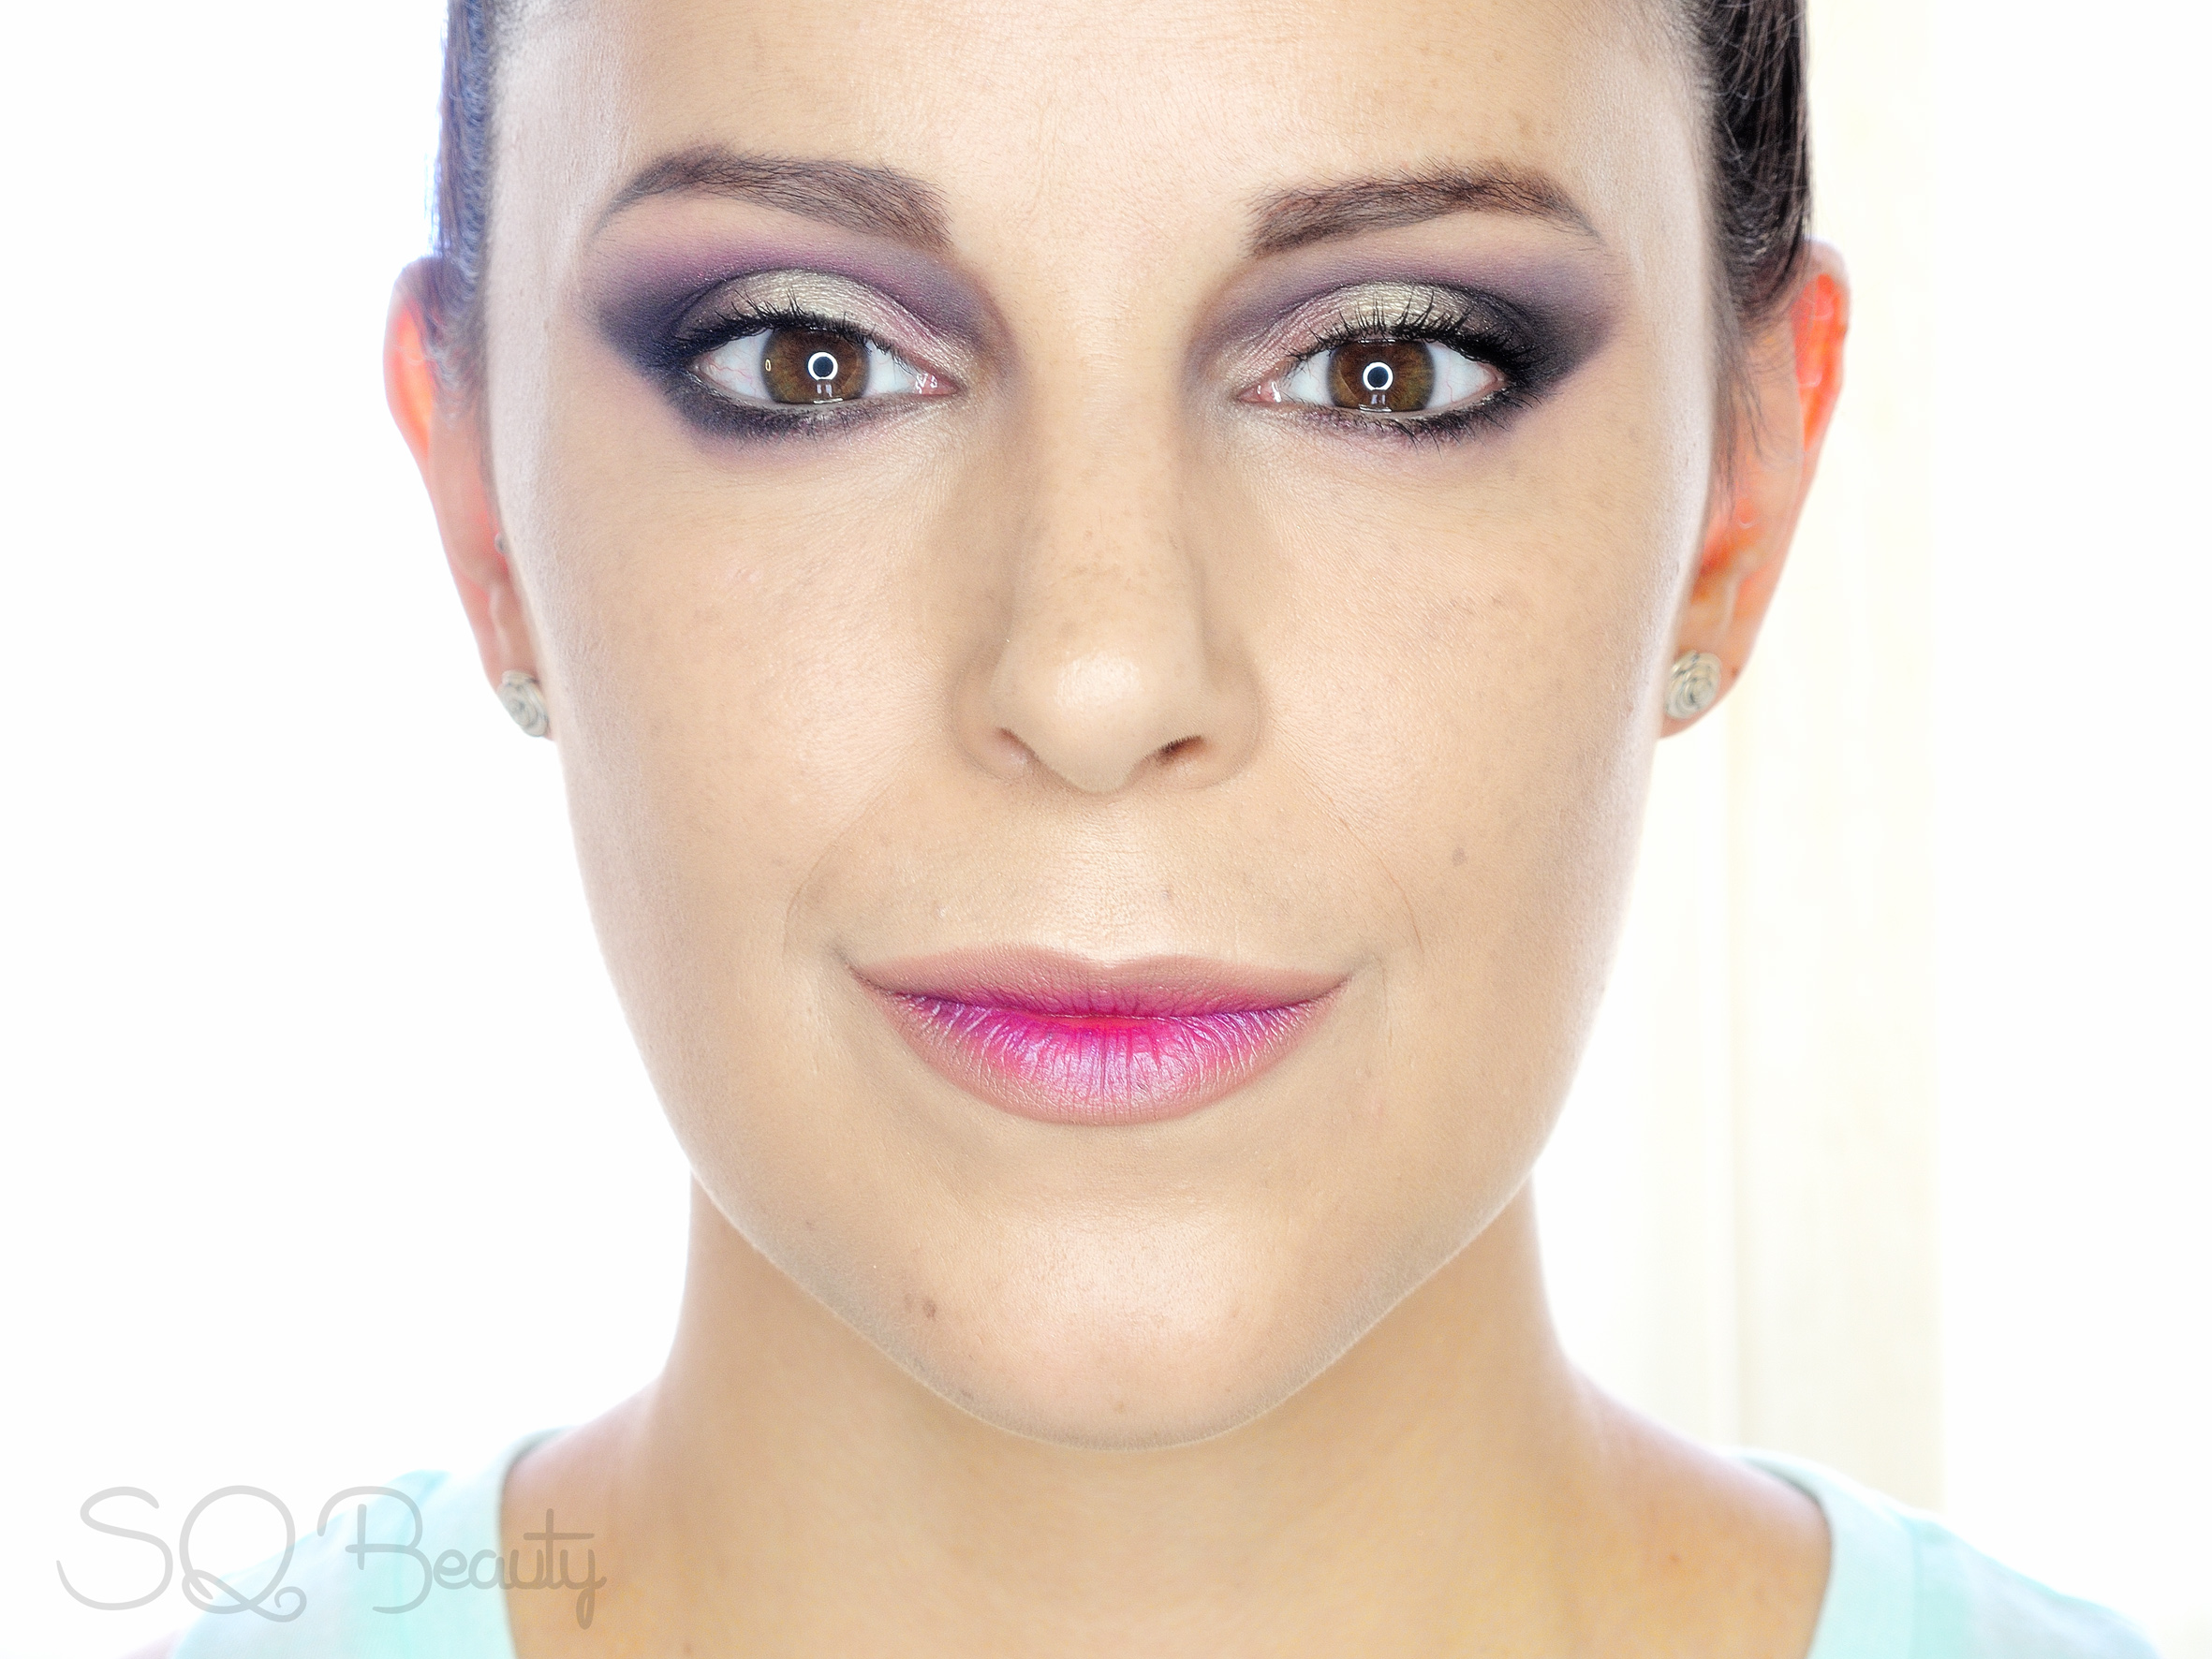 Maquillaje morado roquero de invierno